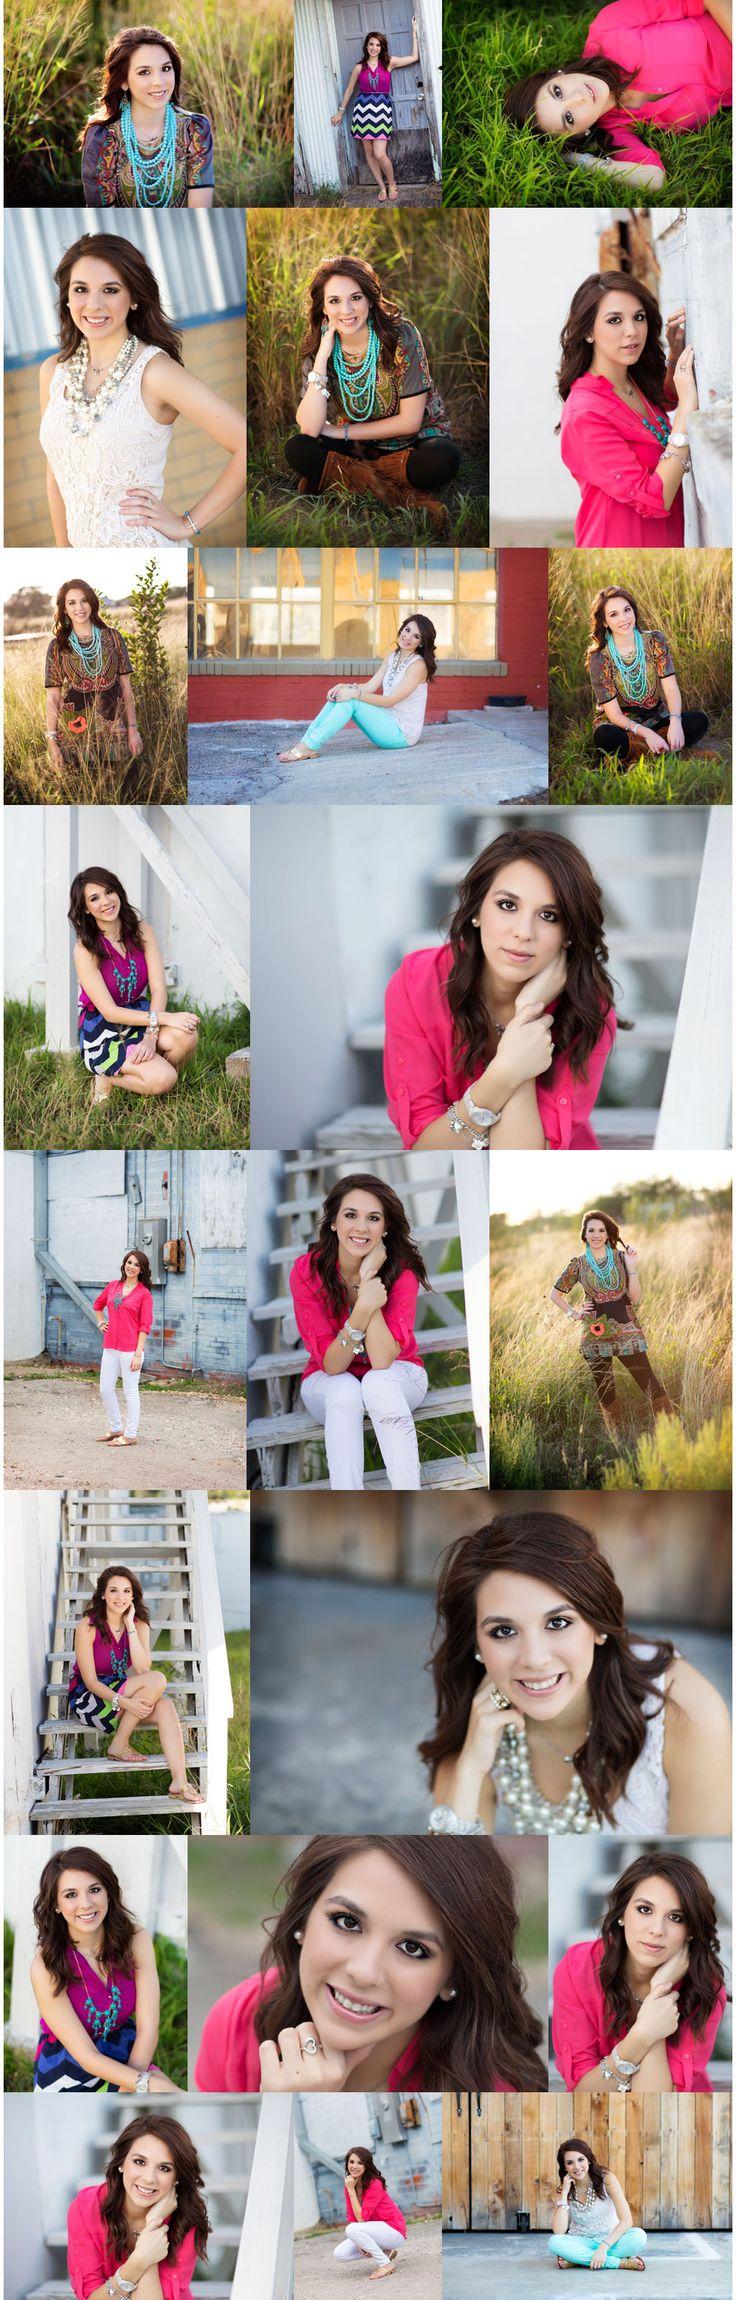 Alexandra Feild. #photogpinspiration #highschool #seniors #photography